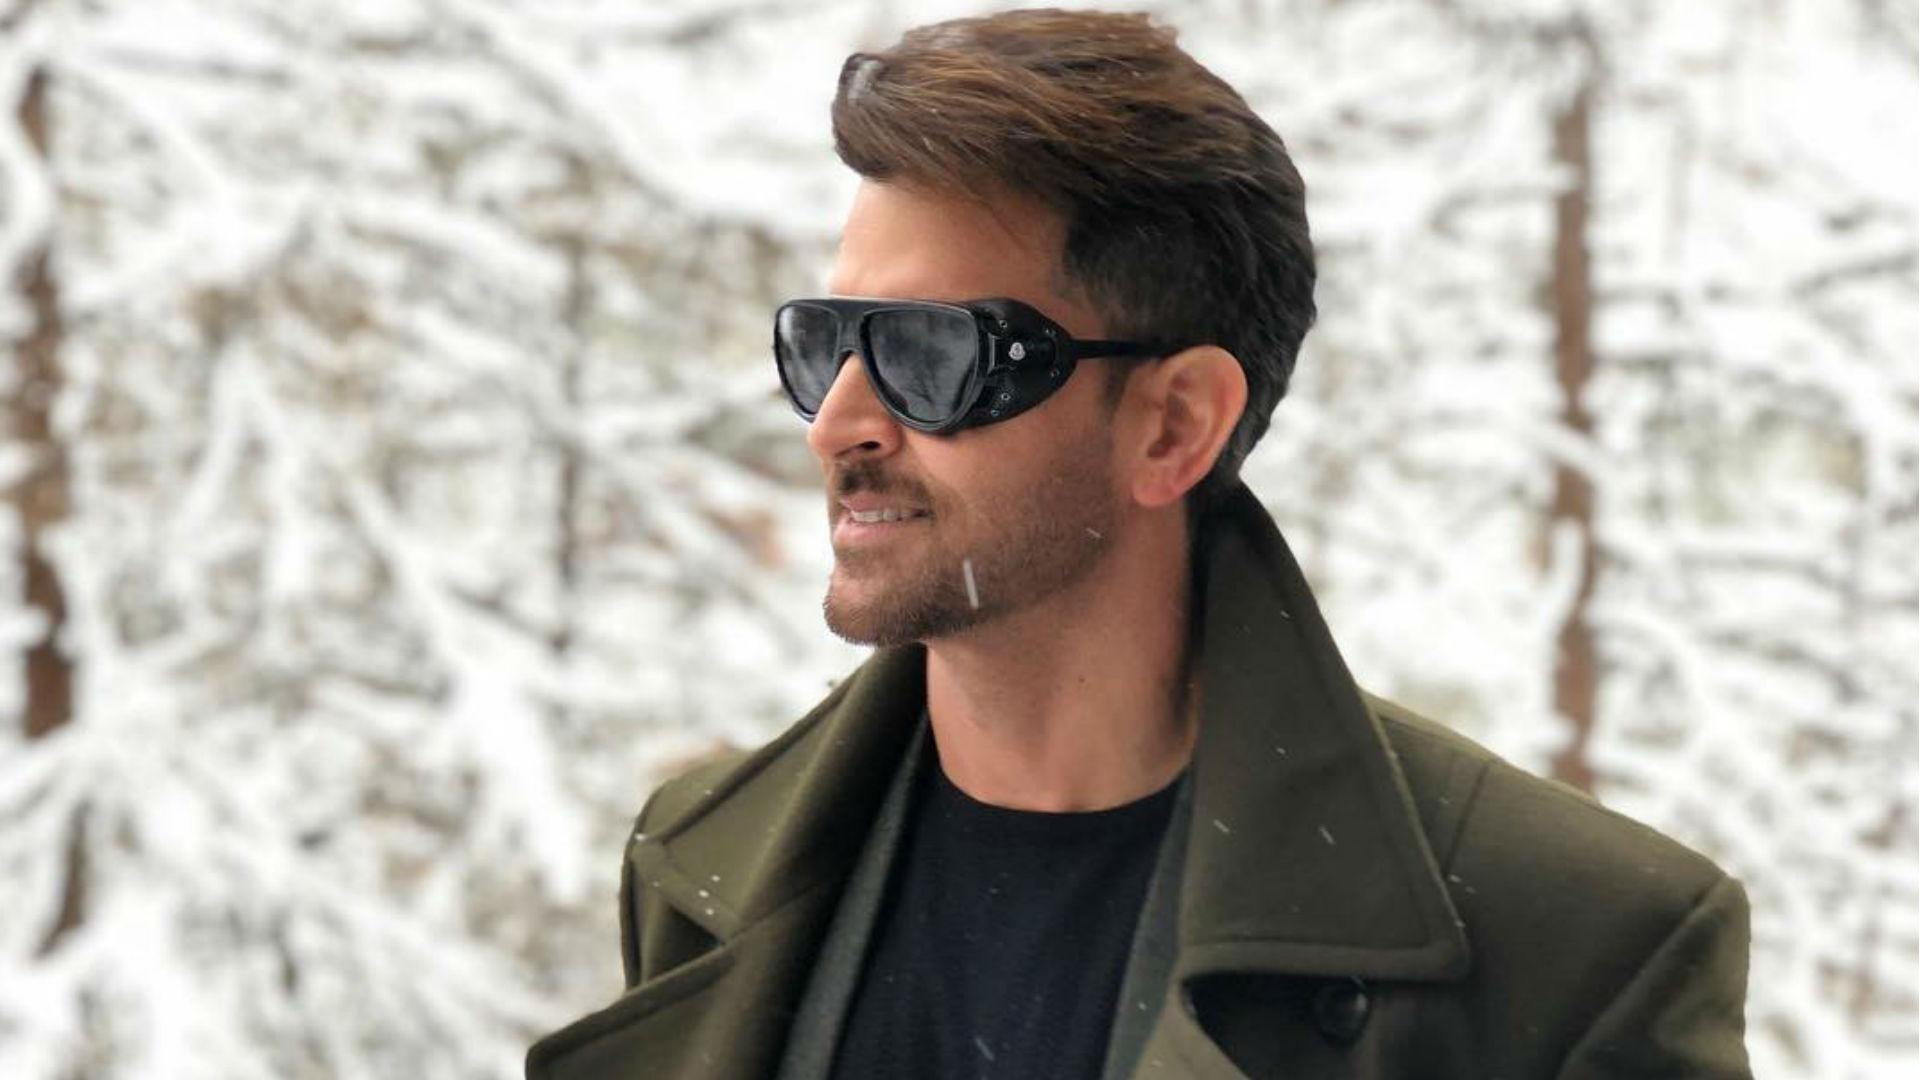 Hrithik Roshan beats Beckham, Robert Pattinson to become the 'World's Most Handsome Man'